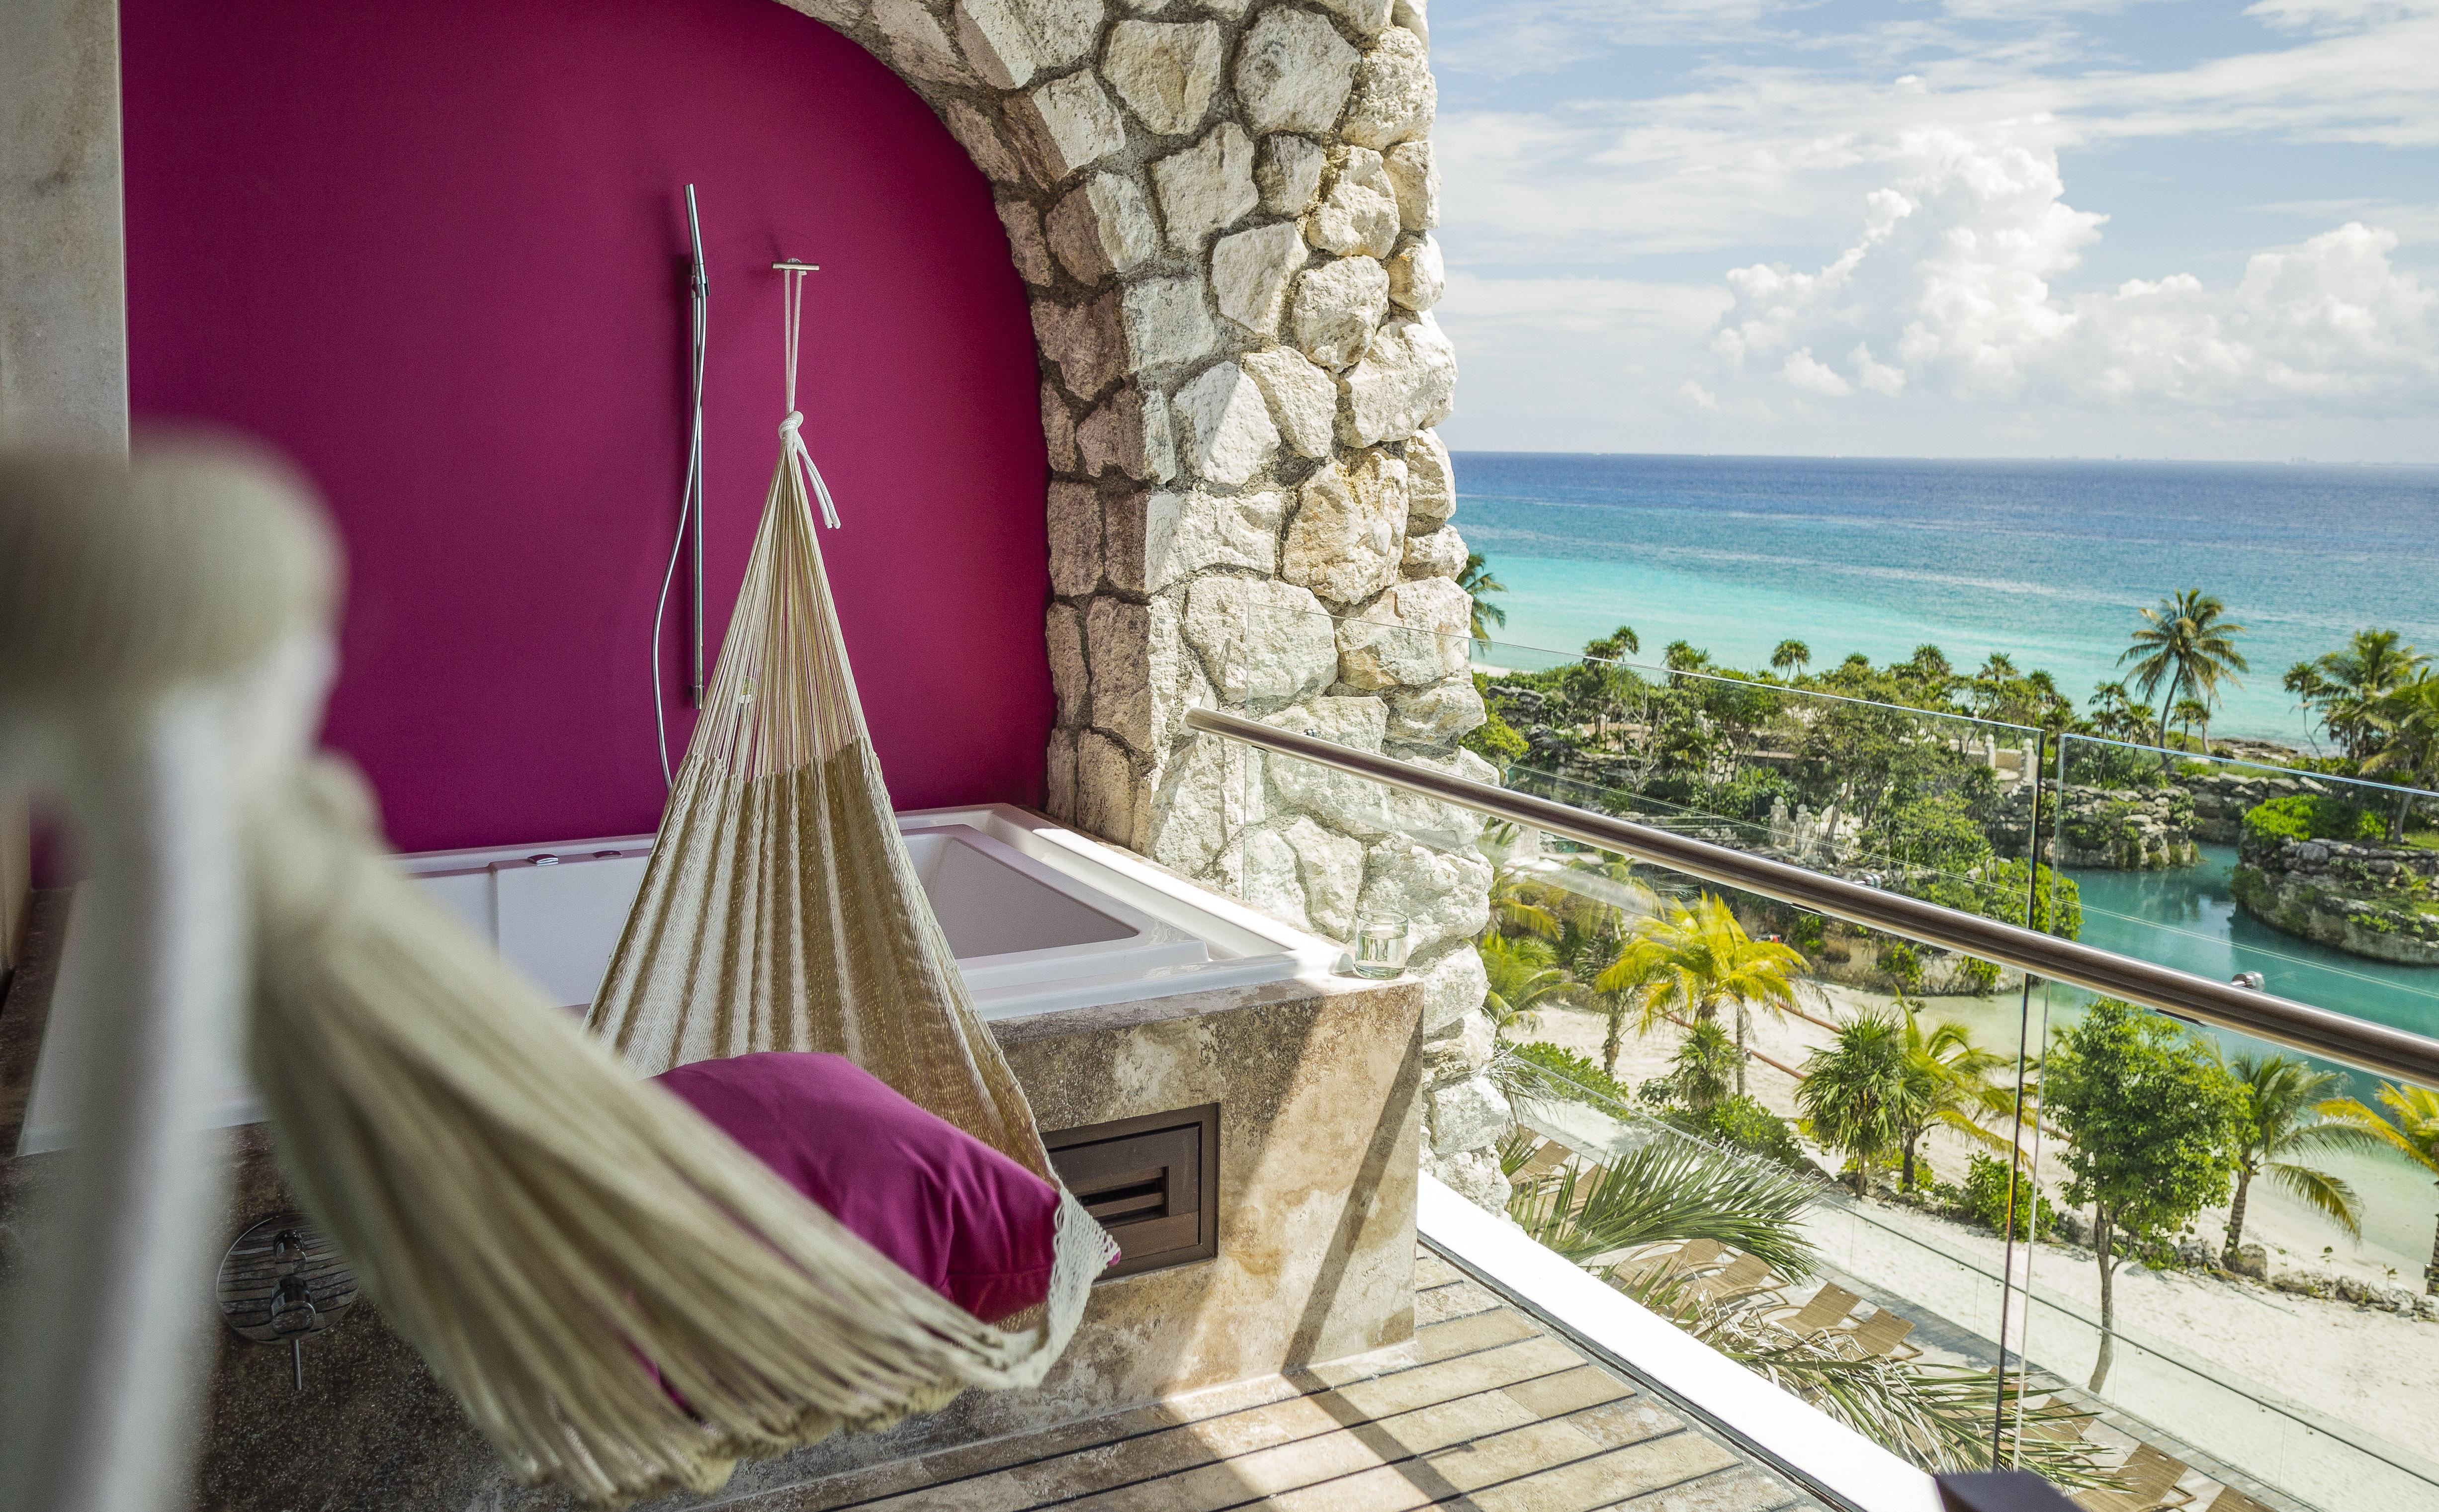 Star Hotel Mexico